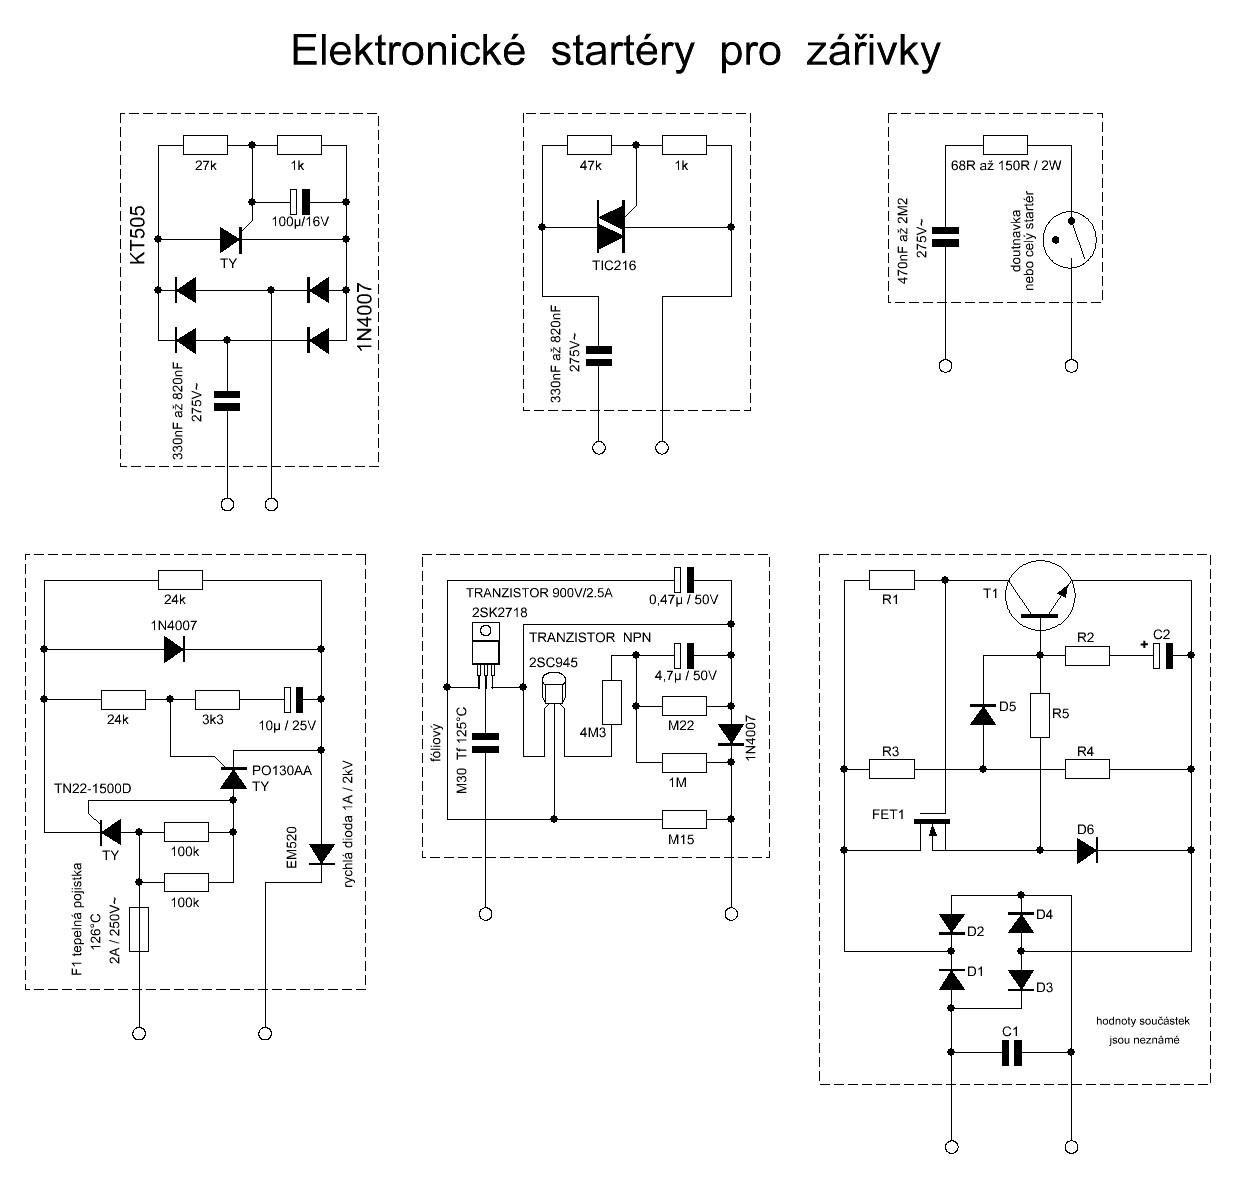 Jak Se Budi Zarivky Aneb Elektronicke Startery Vyvoj Hw Cz